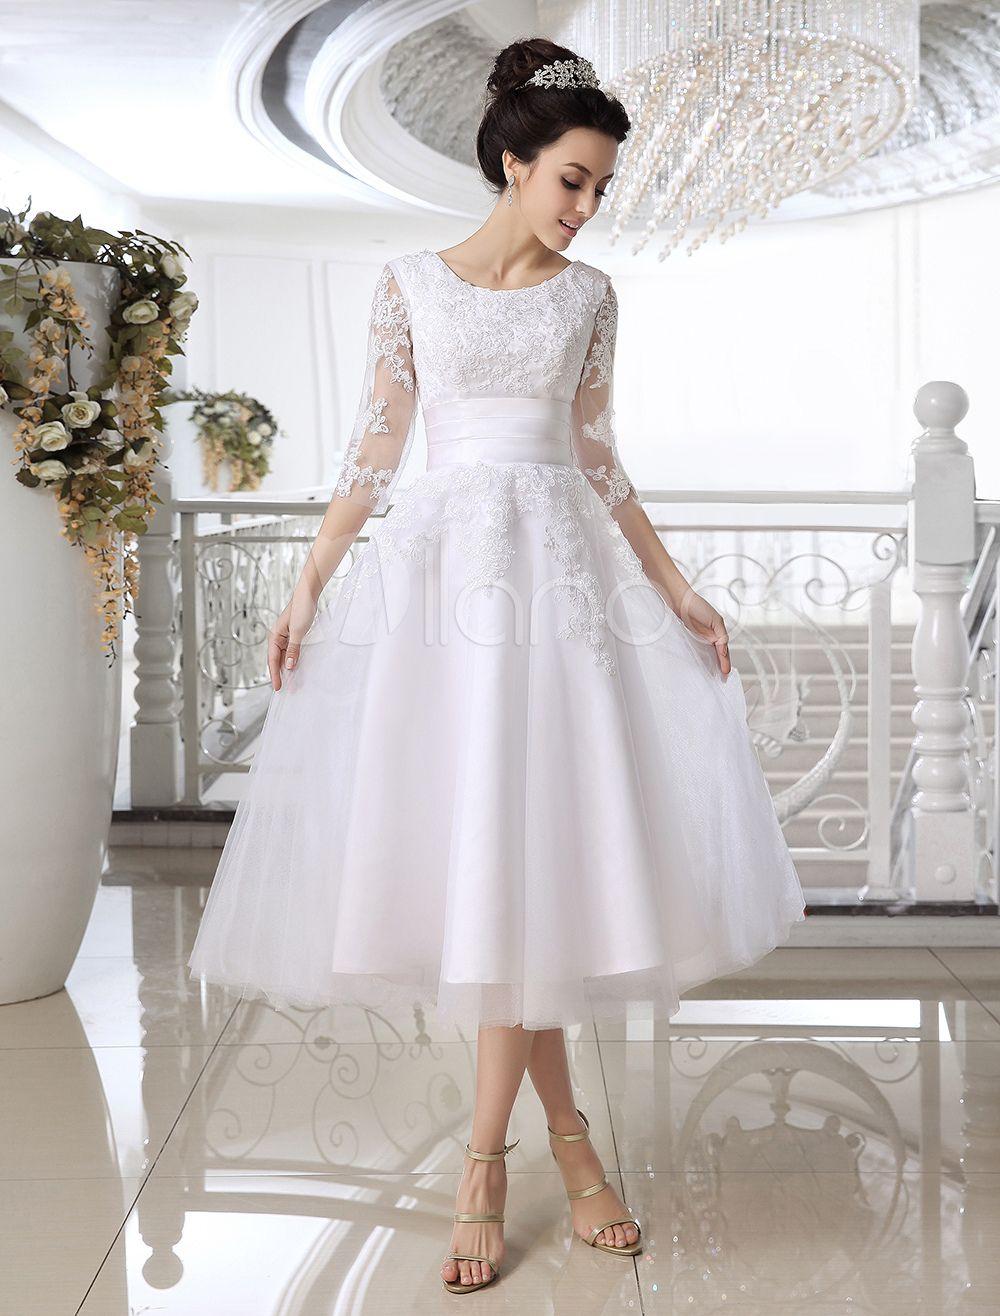 T-length lace wedding dresses november 2018 White wedding dresses  short lace Applique illusion half sleeve